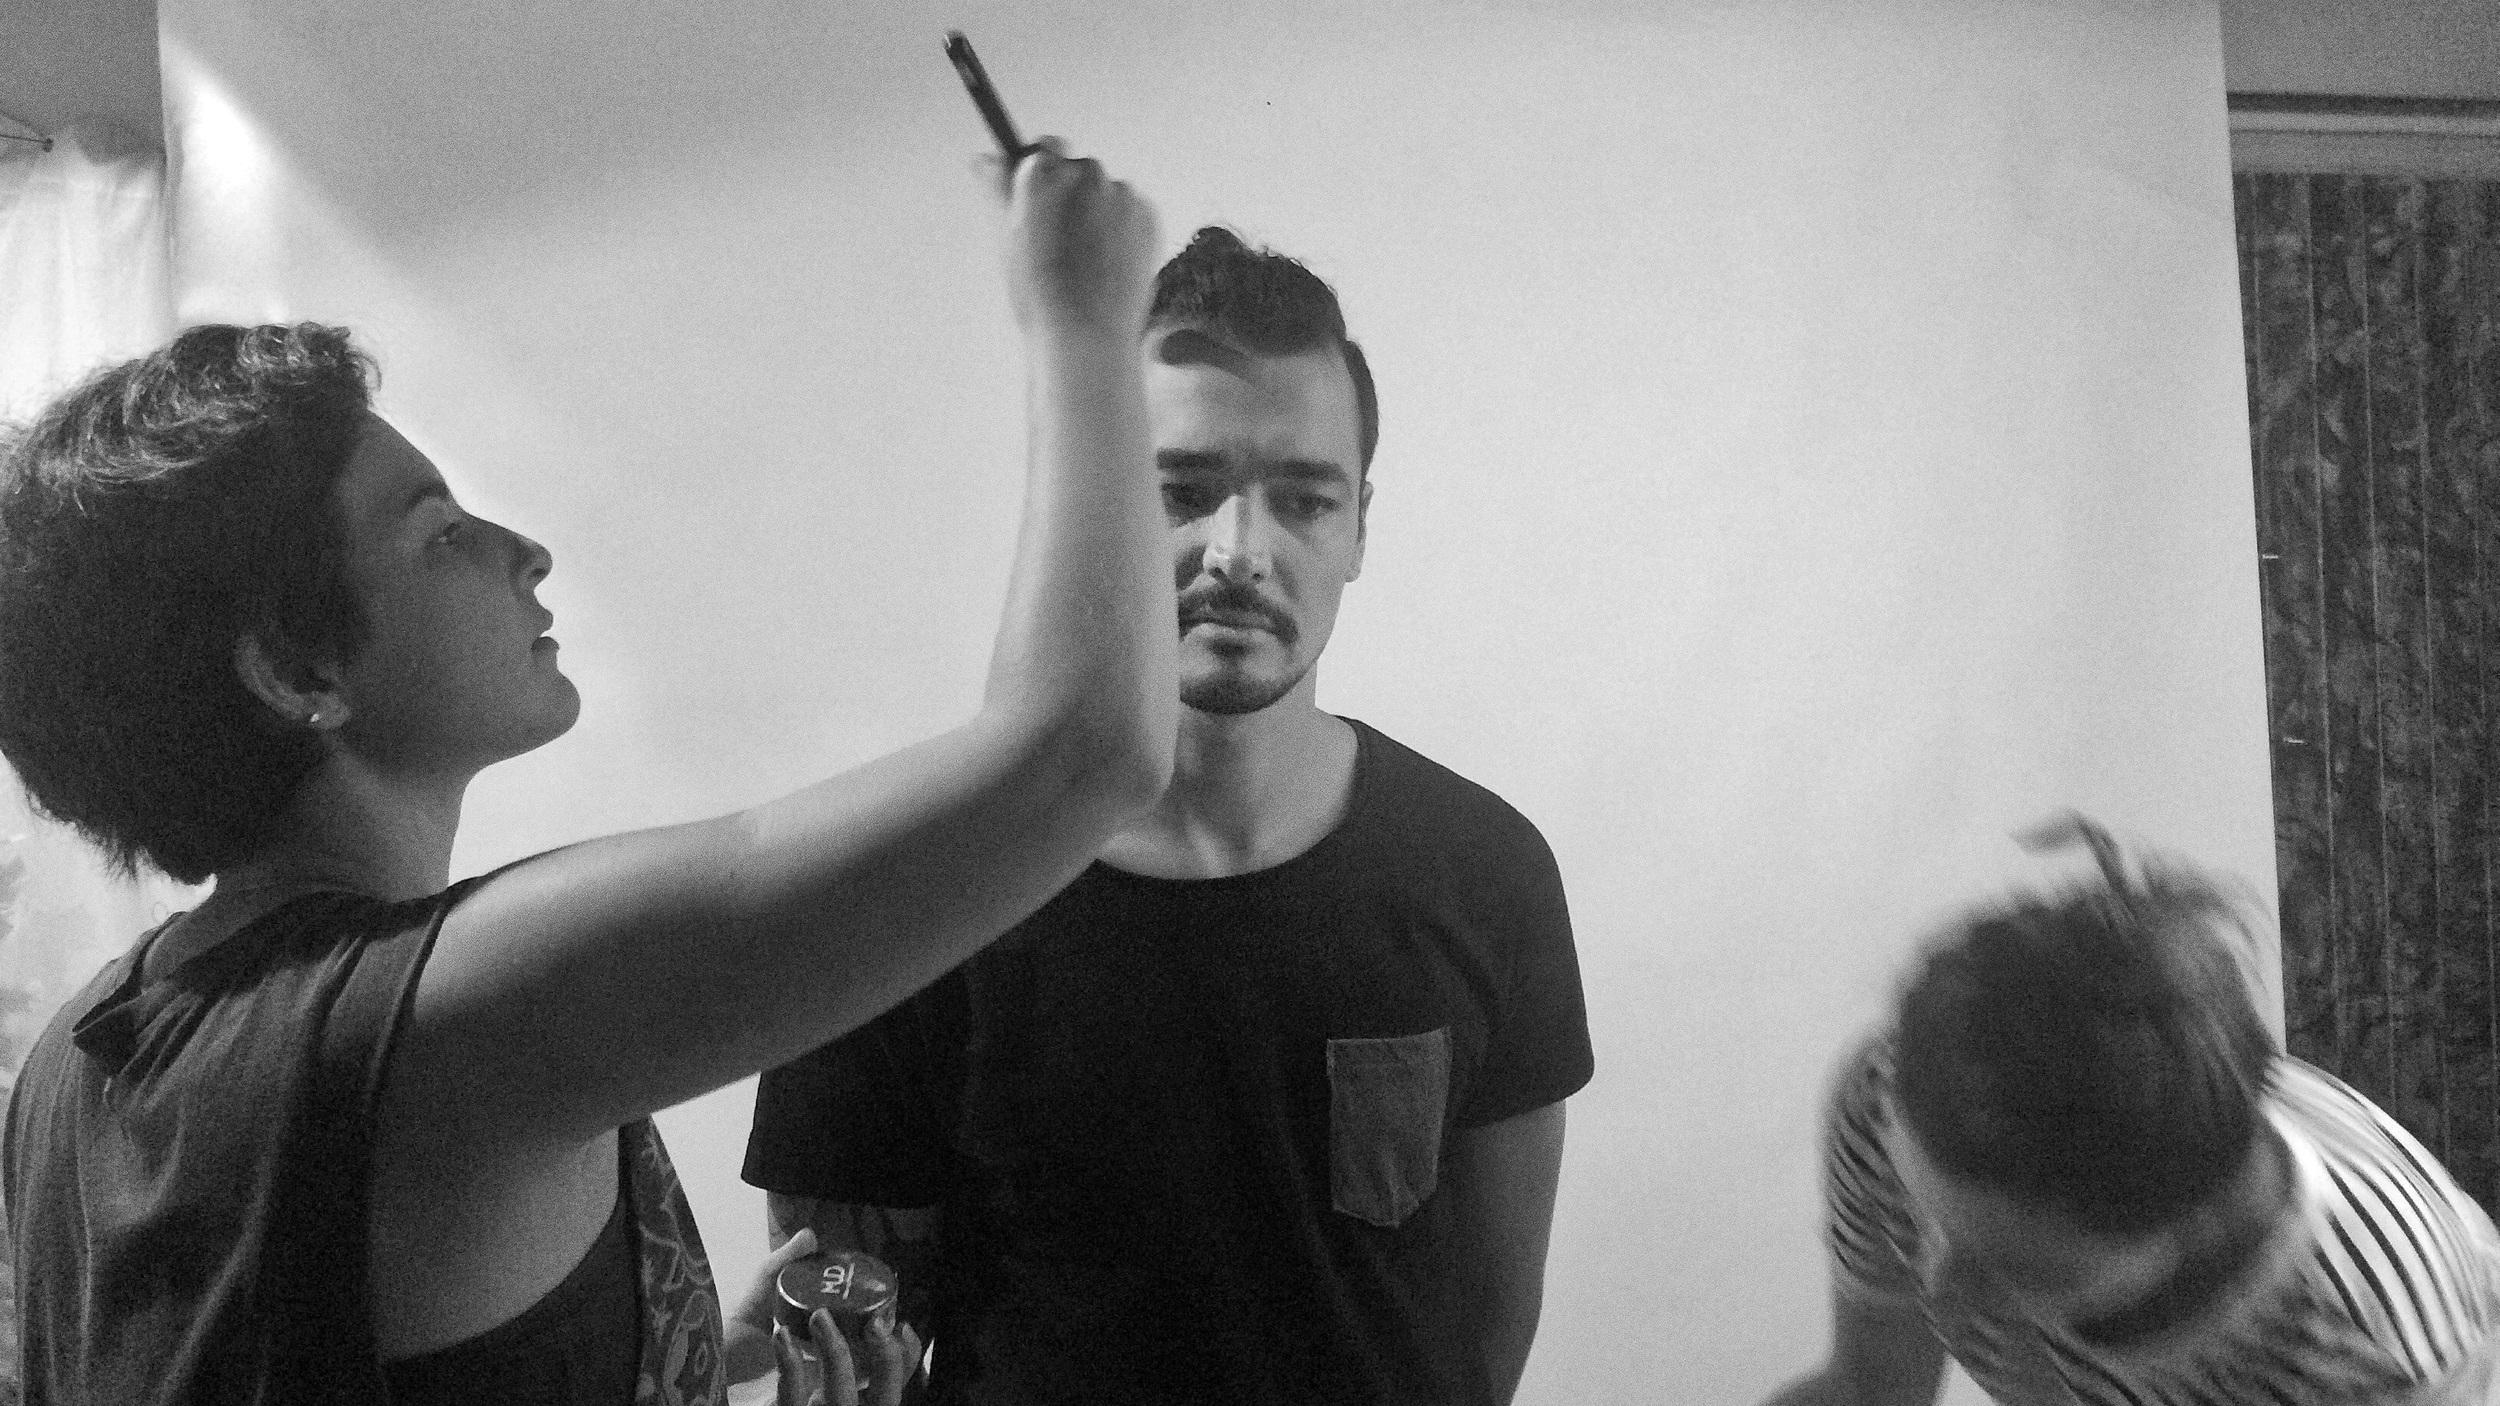 Cris Grego + Natie Cortez + Dani Bussab